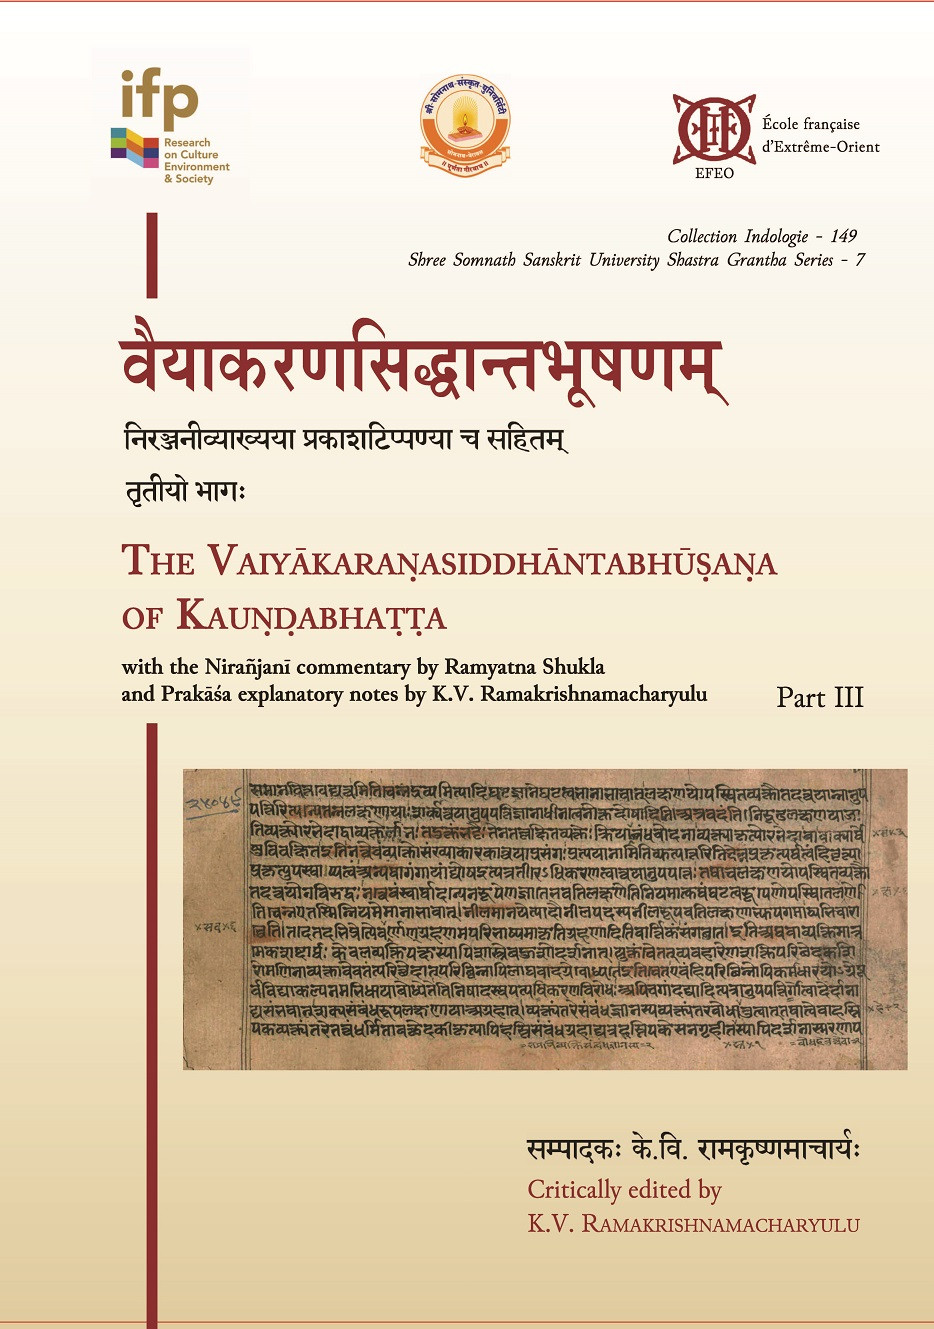 The Vaiyākaraṇasiddhāntabhūṣaṇa of Kauṇḍabhaṭṭa